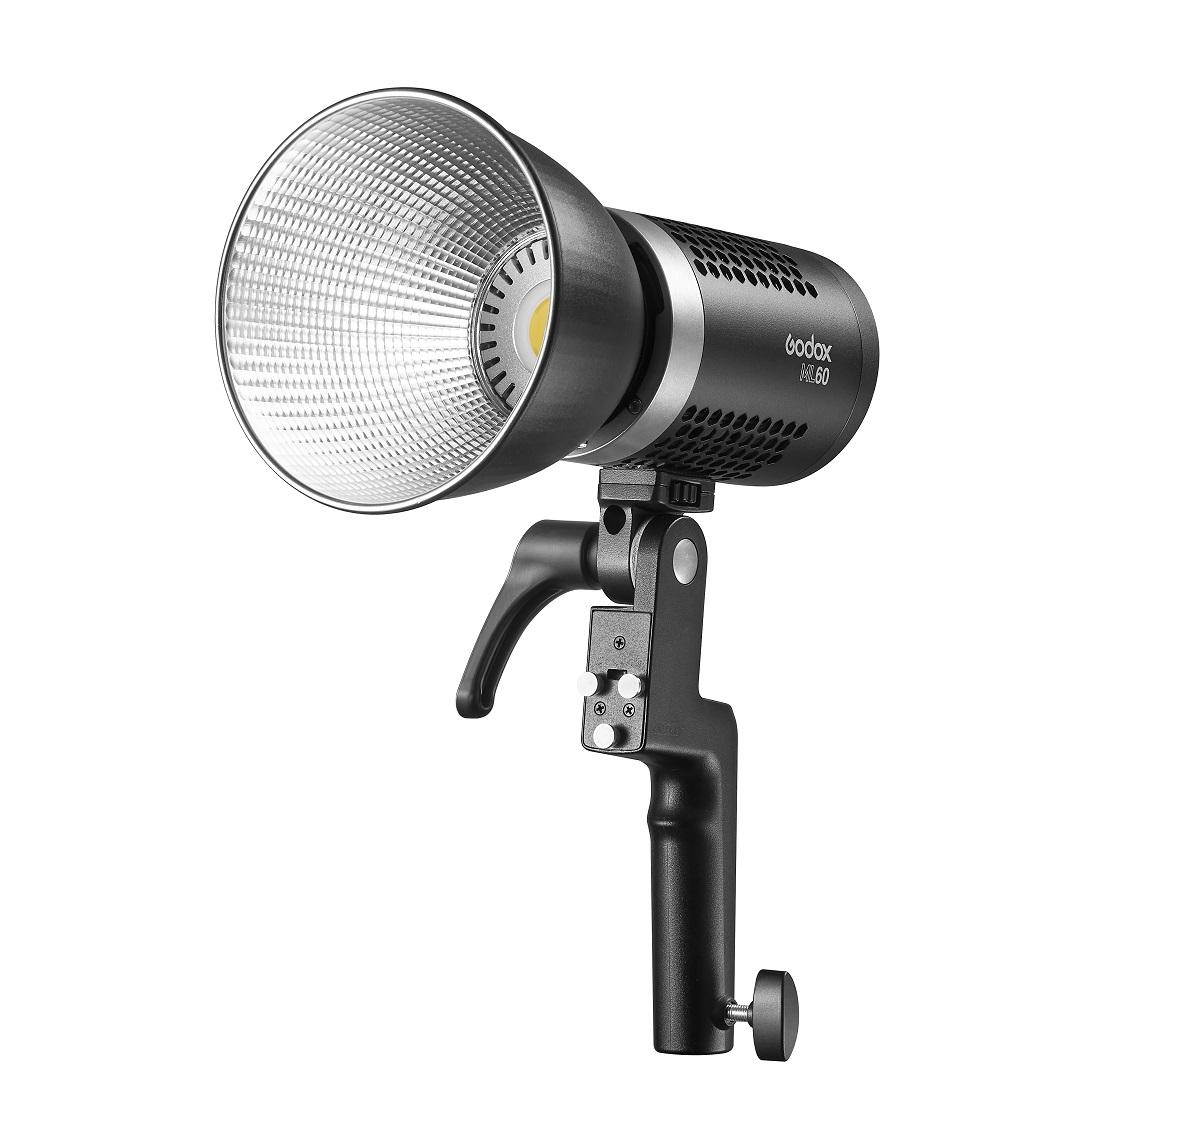 Godox ML60 professionelle LED Leuchte Serie ML